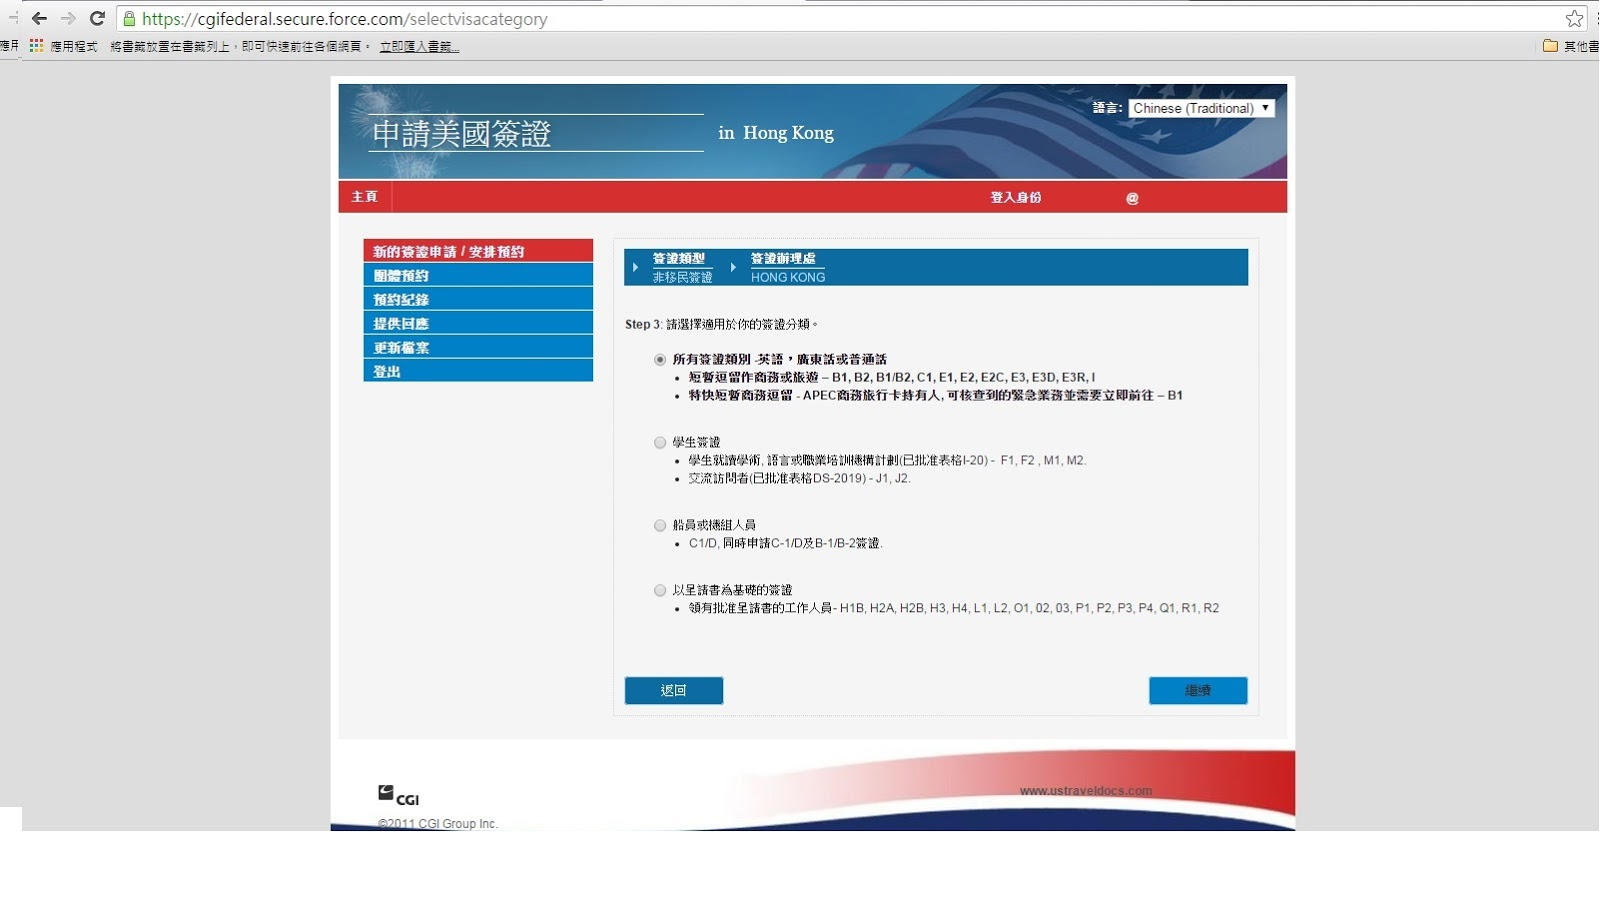 【美國遊】在香港如何申請美國簽證(上)網上預約篇 How to apply USA visa in Hong Kong(I) - Online Application - The Bee Diary